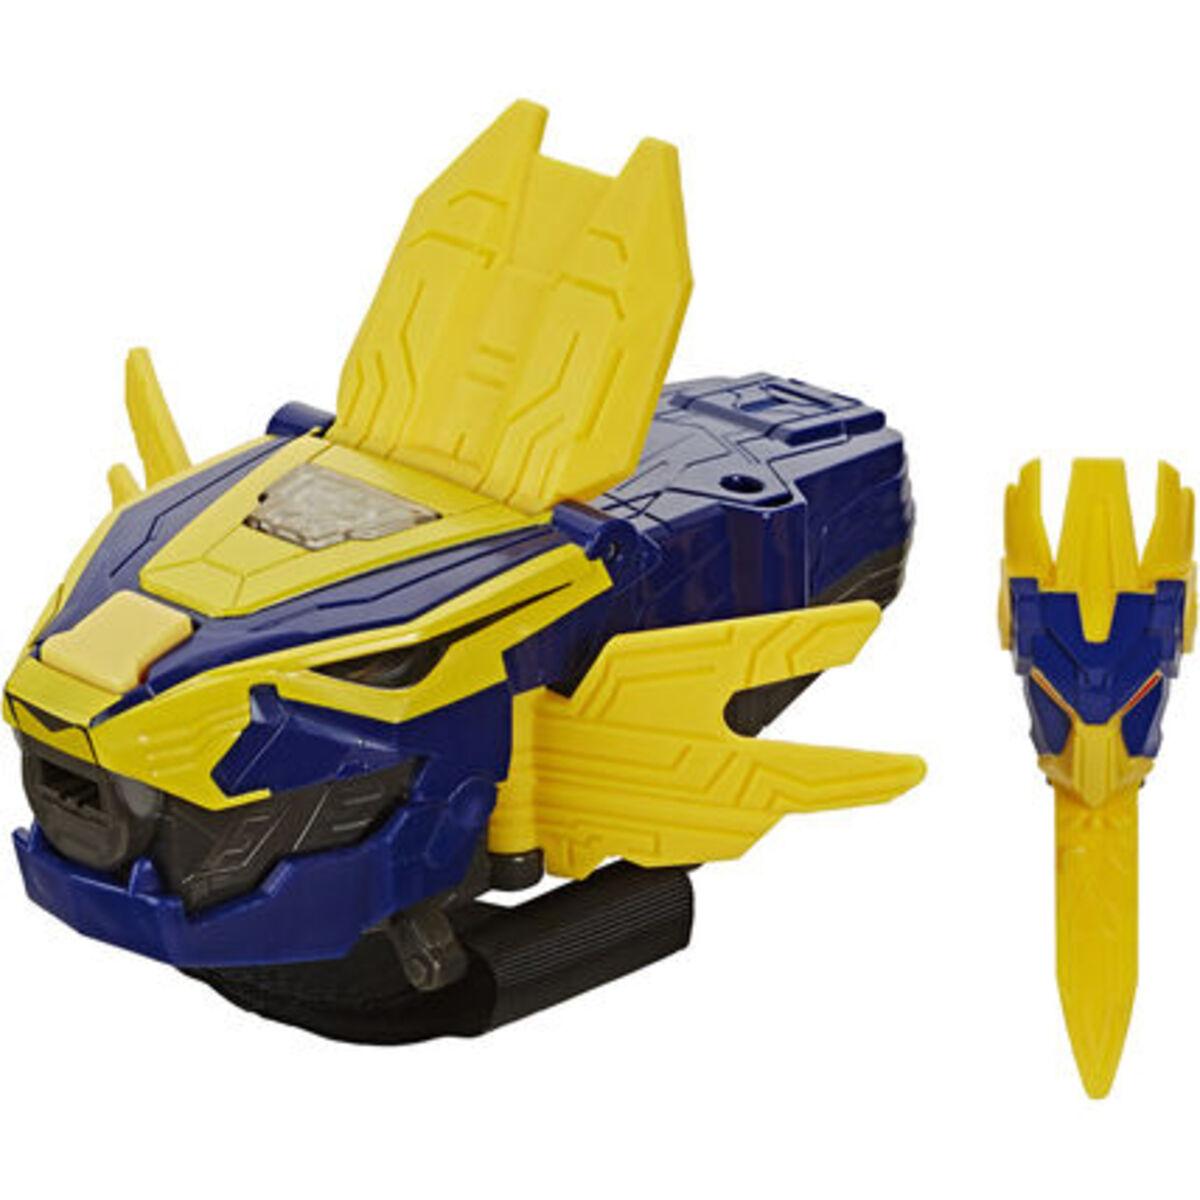 "Bild 1 von Hasbro Power Rangers - Beast Morphers ""Beast-X King Morpher"""